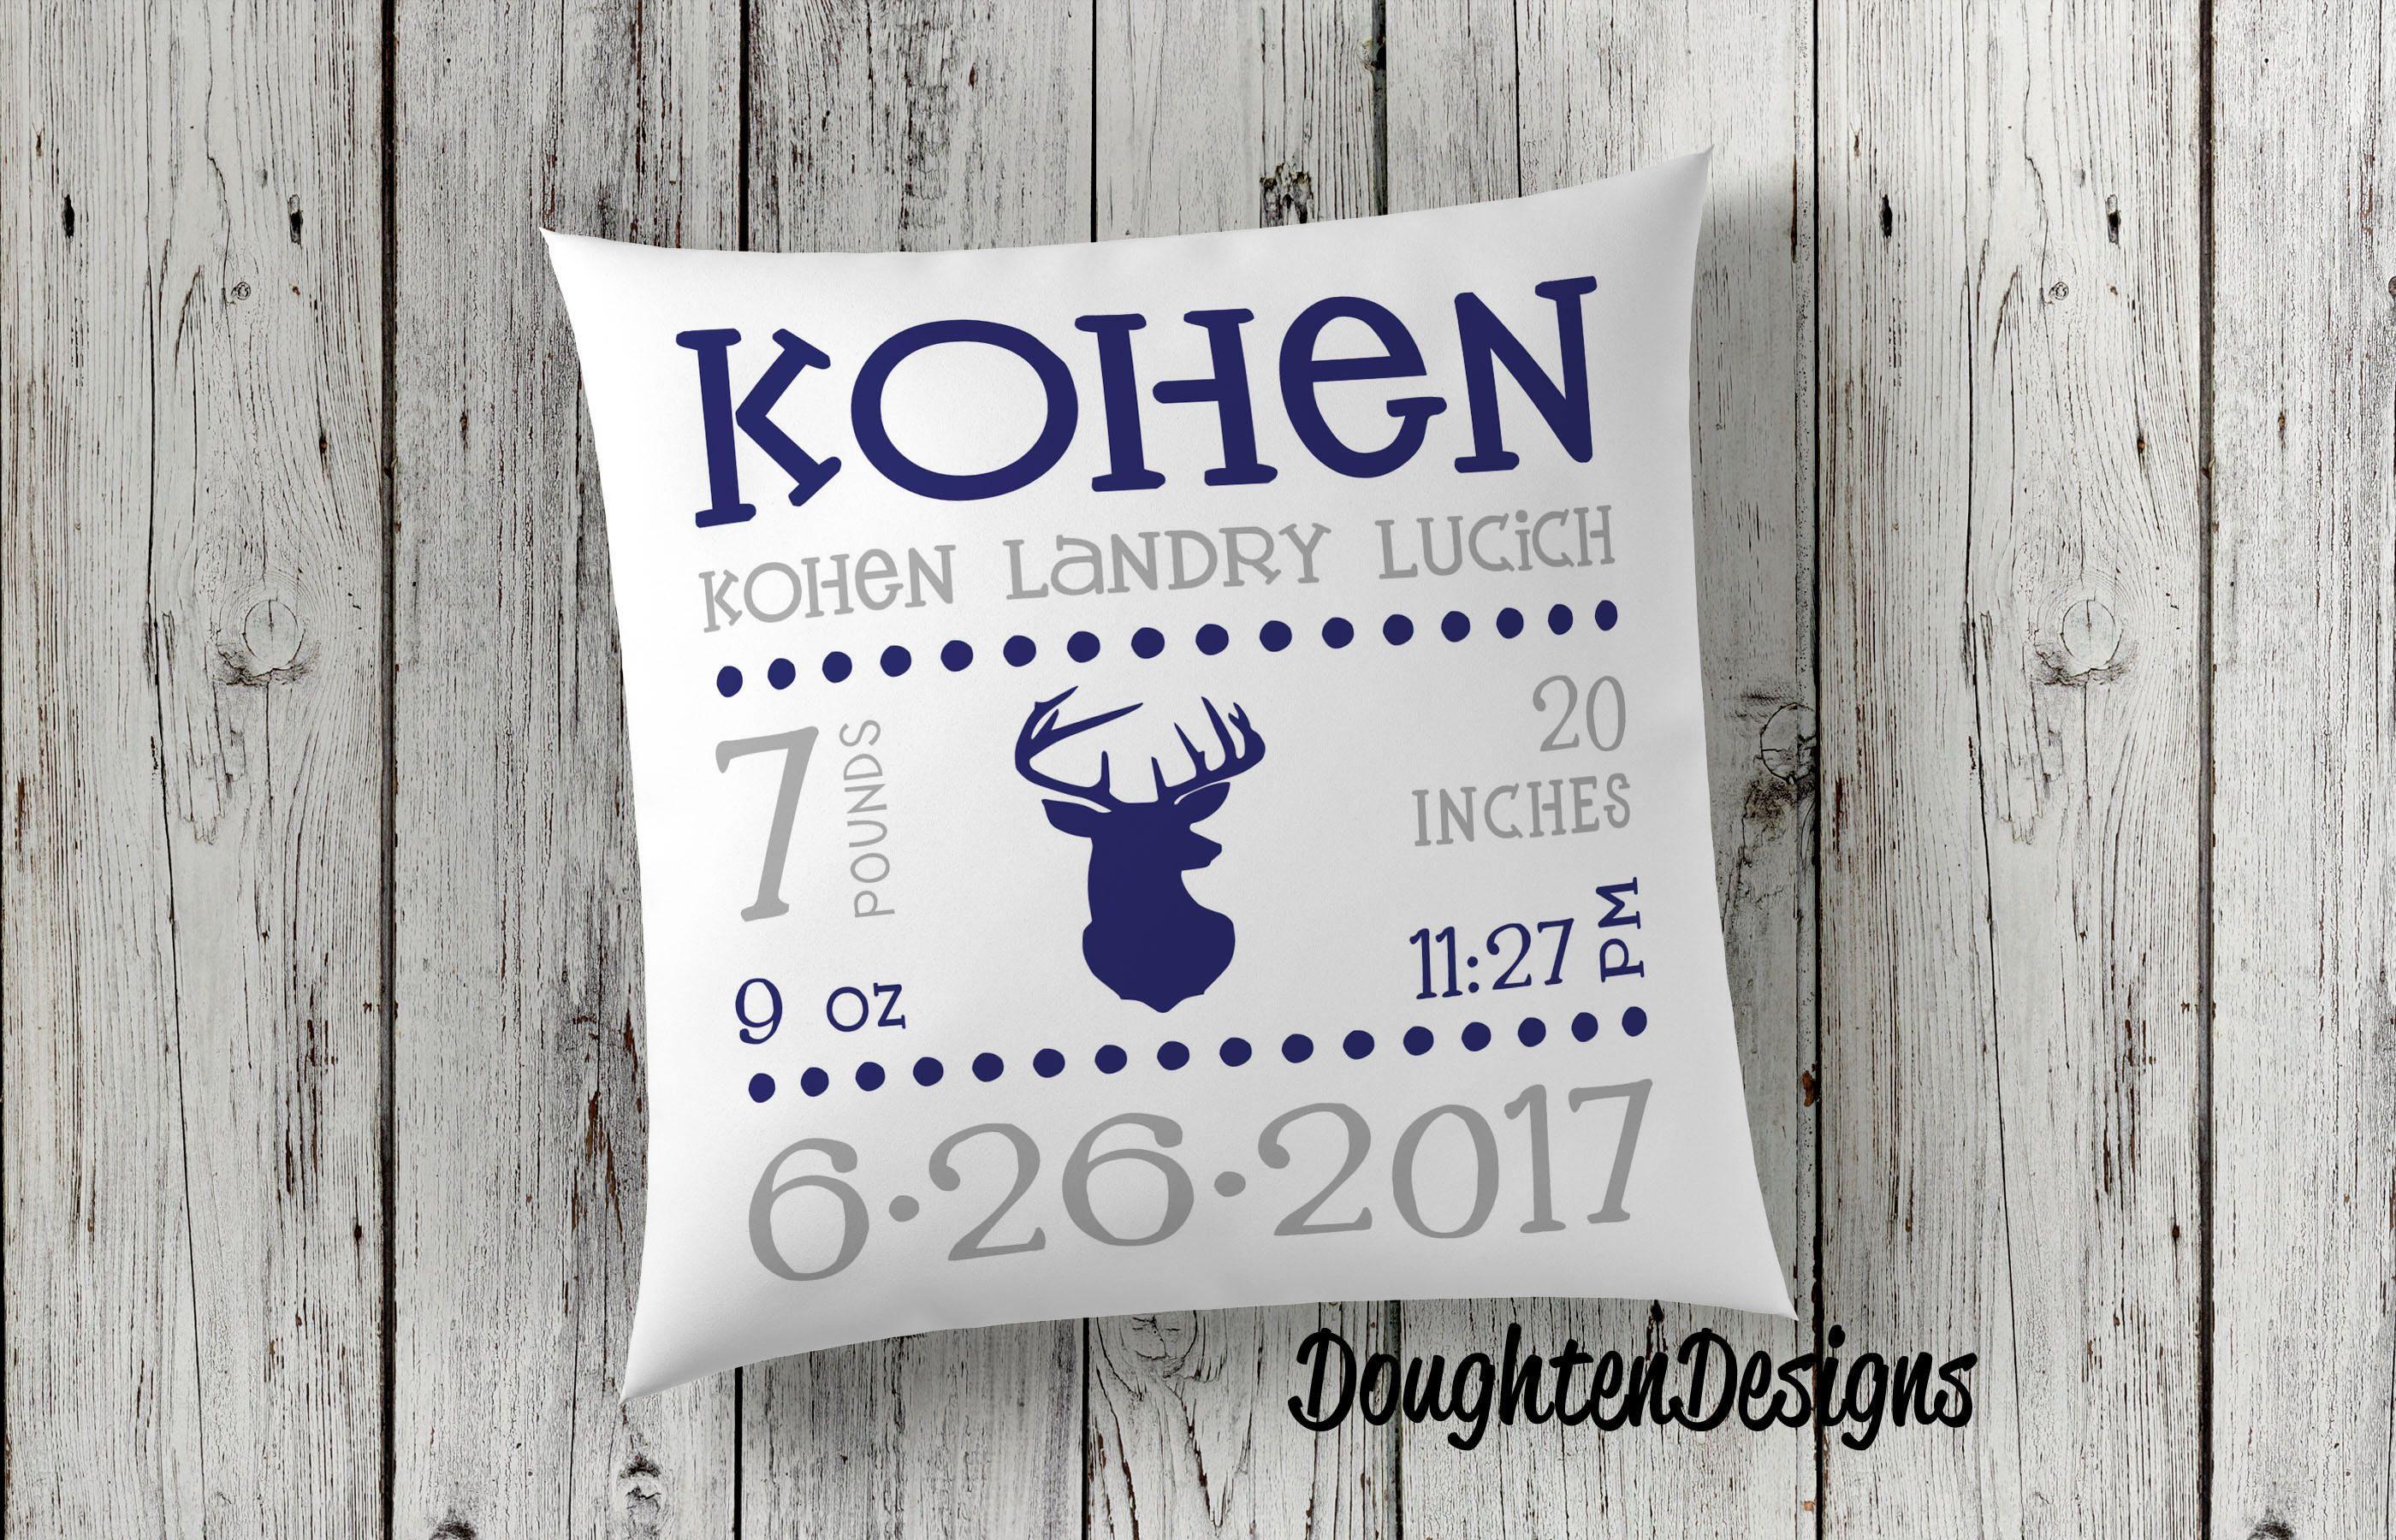 christening baptism pillows copy shop sash housewares karev pillow personalized monogrammed